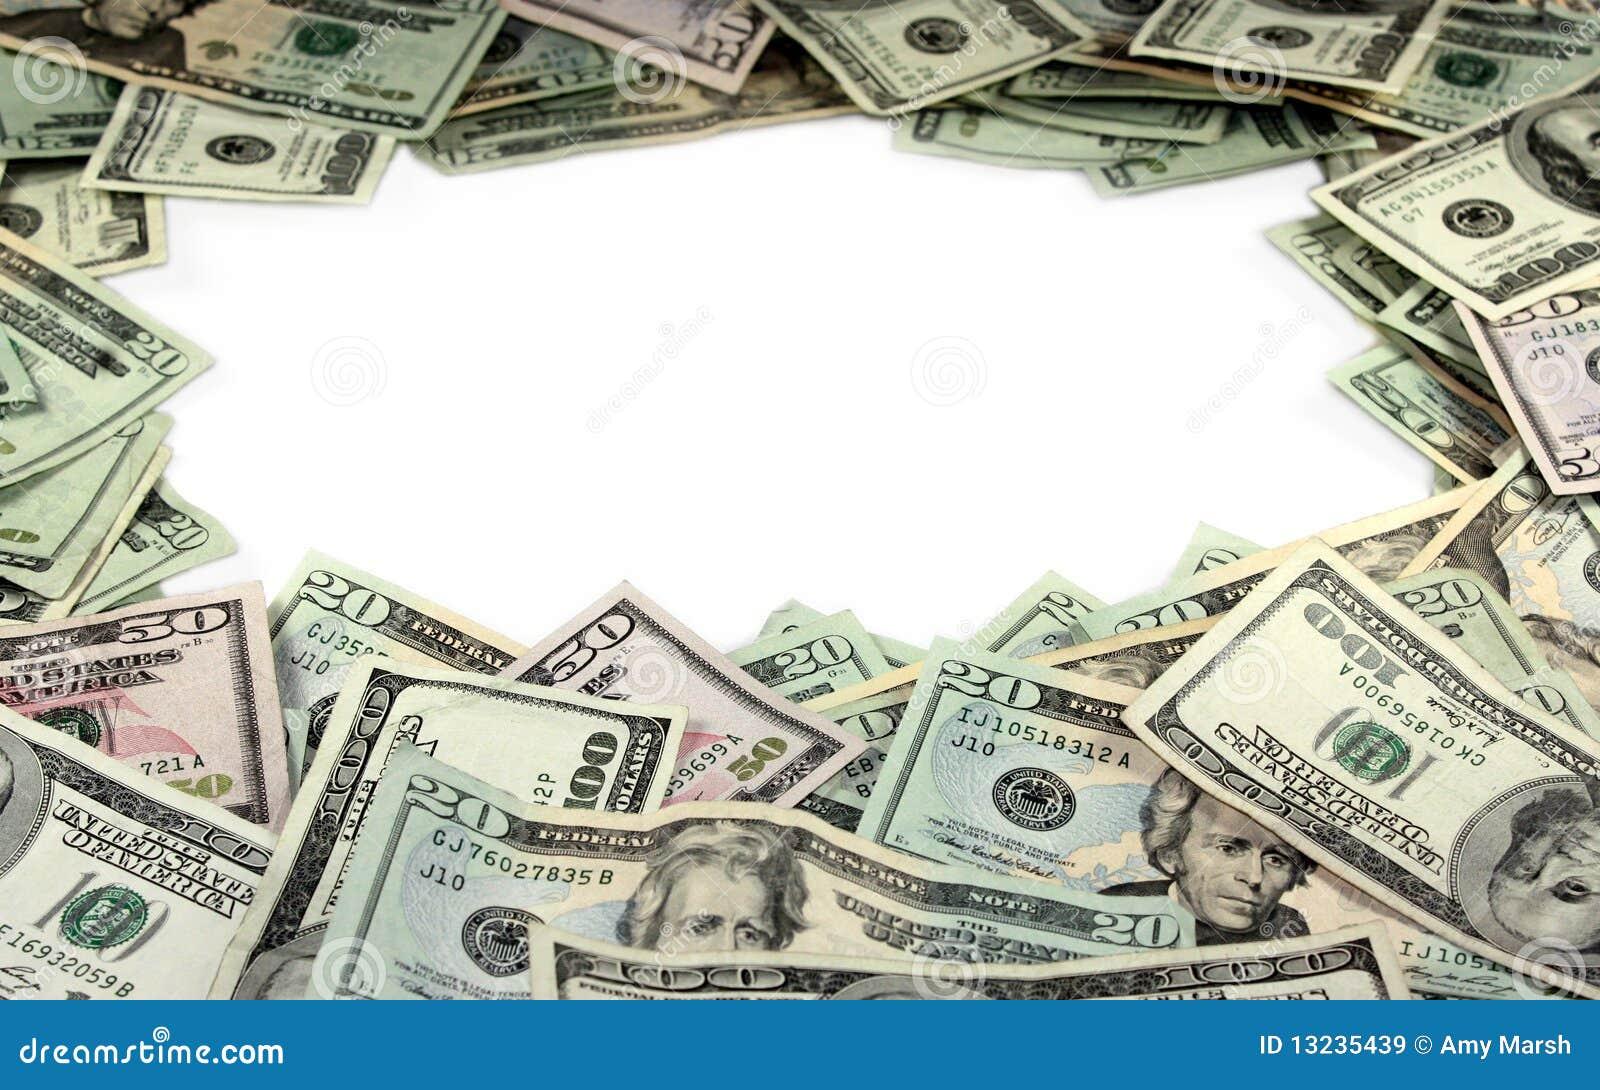 Money Border Clip Art money border royalty free stock image - image ...